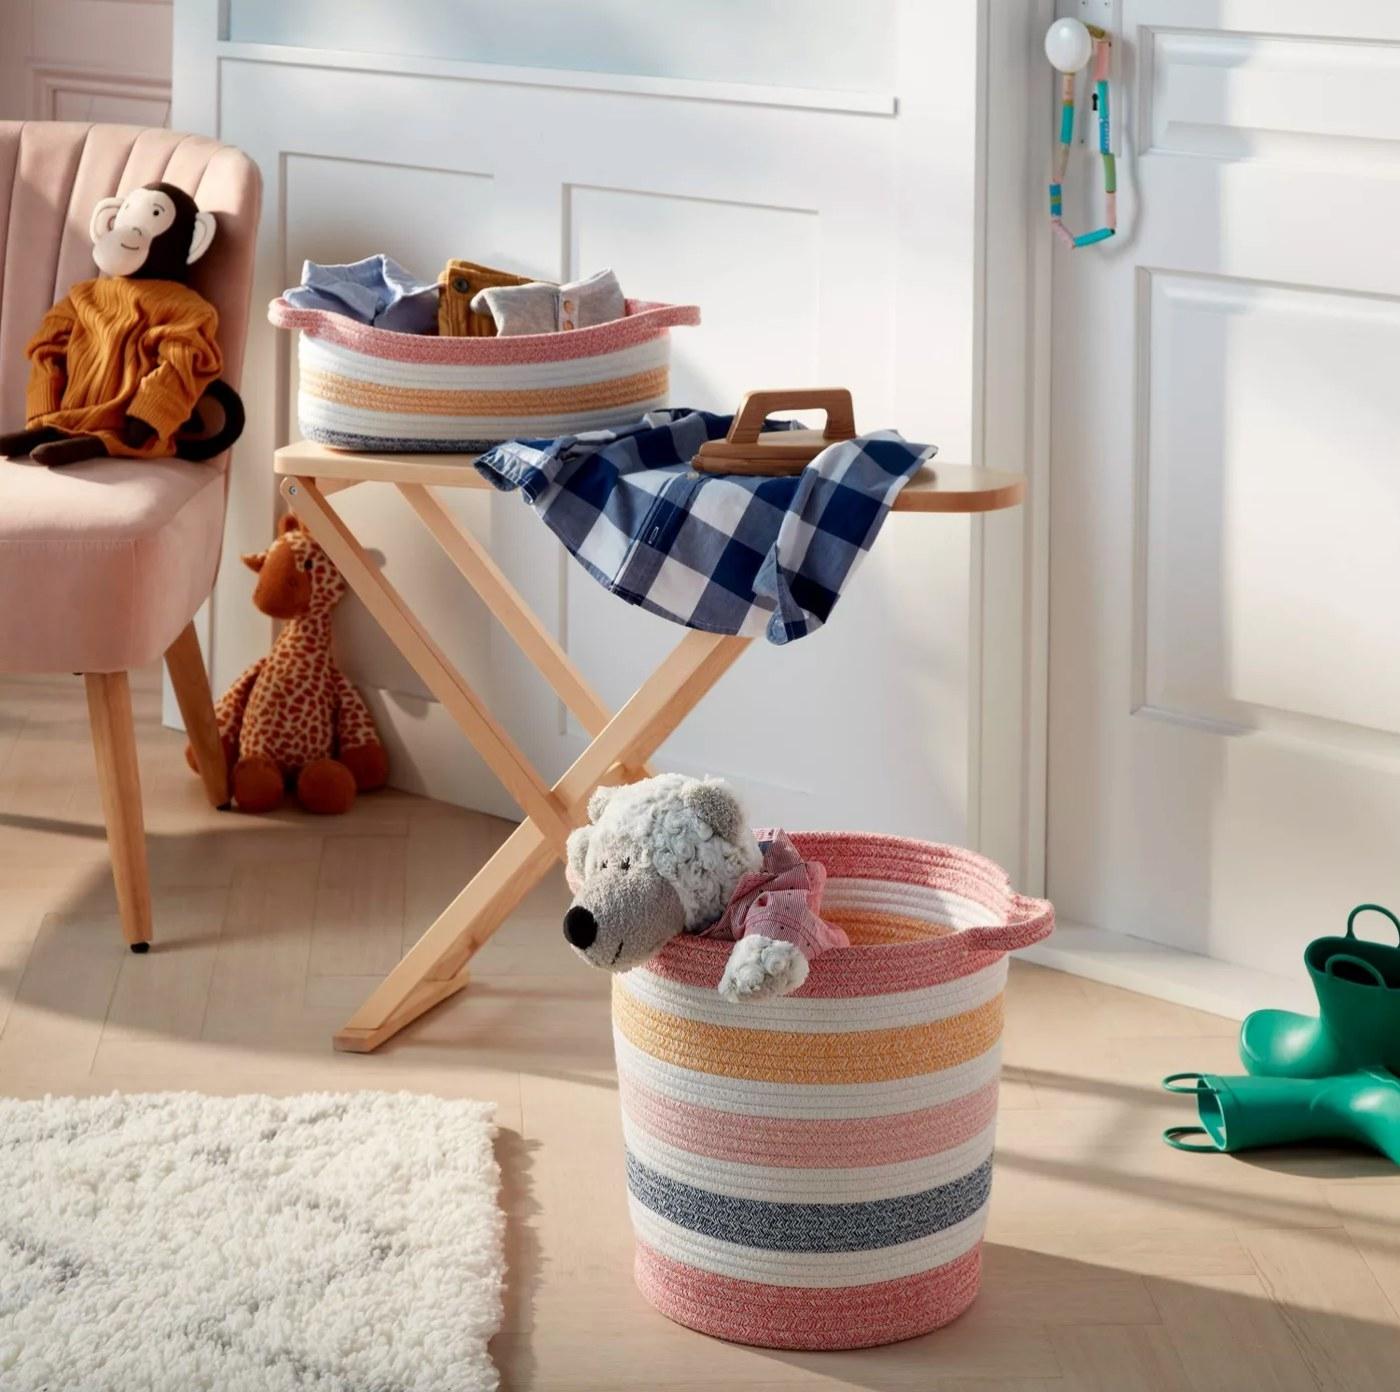 The multi-stripe rope storage bin holding children's toys